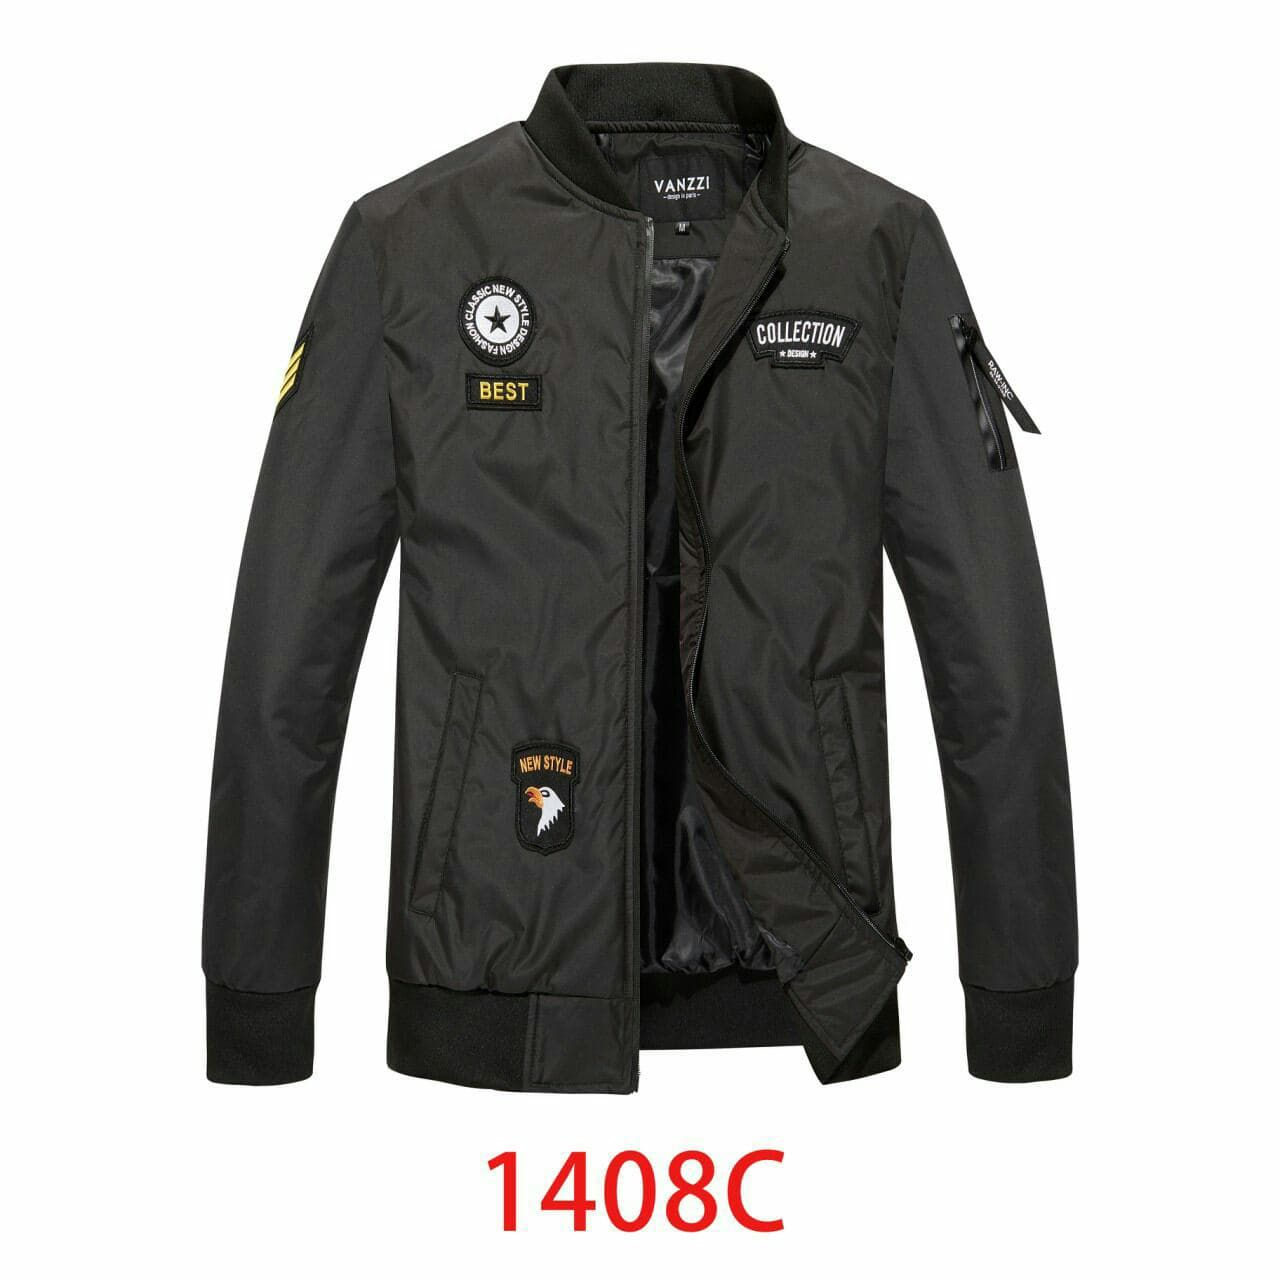 Bomberka Meska Kurtka Wiosenna Czarna 40 M 7211168971 Oficjalne Archiwum Allegro Jackets Fashion Motorcycle Jacket